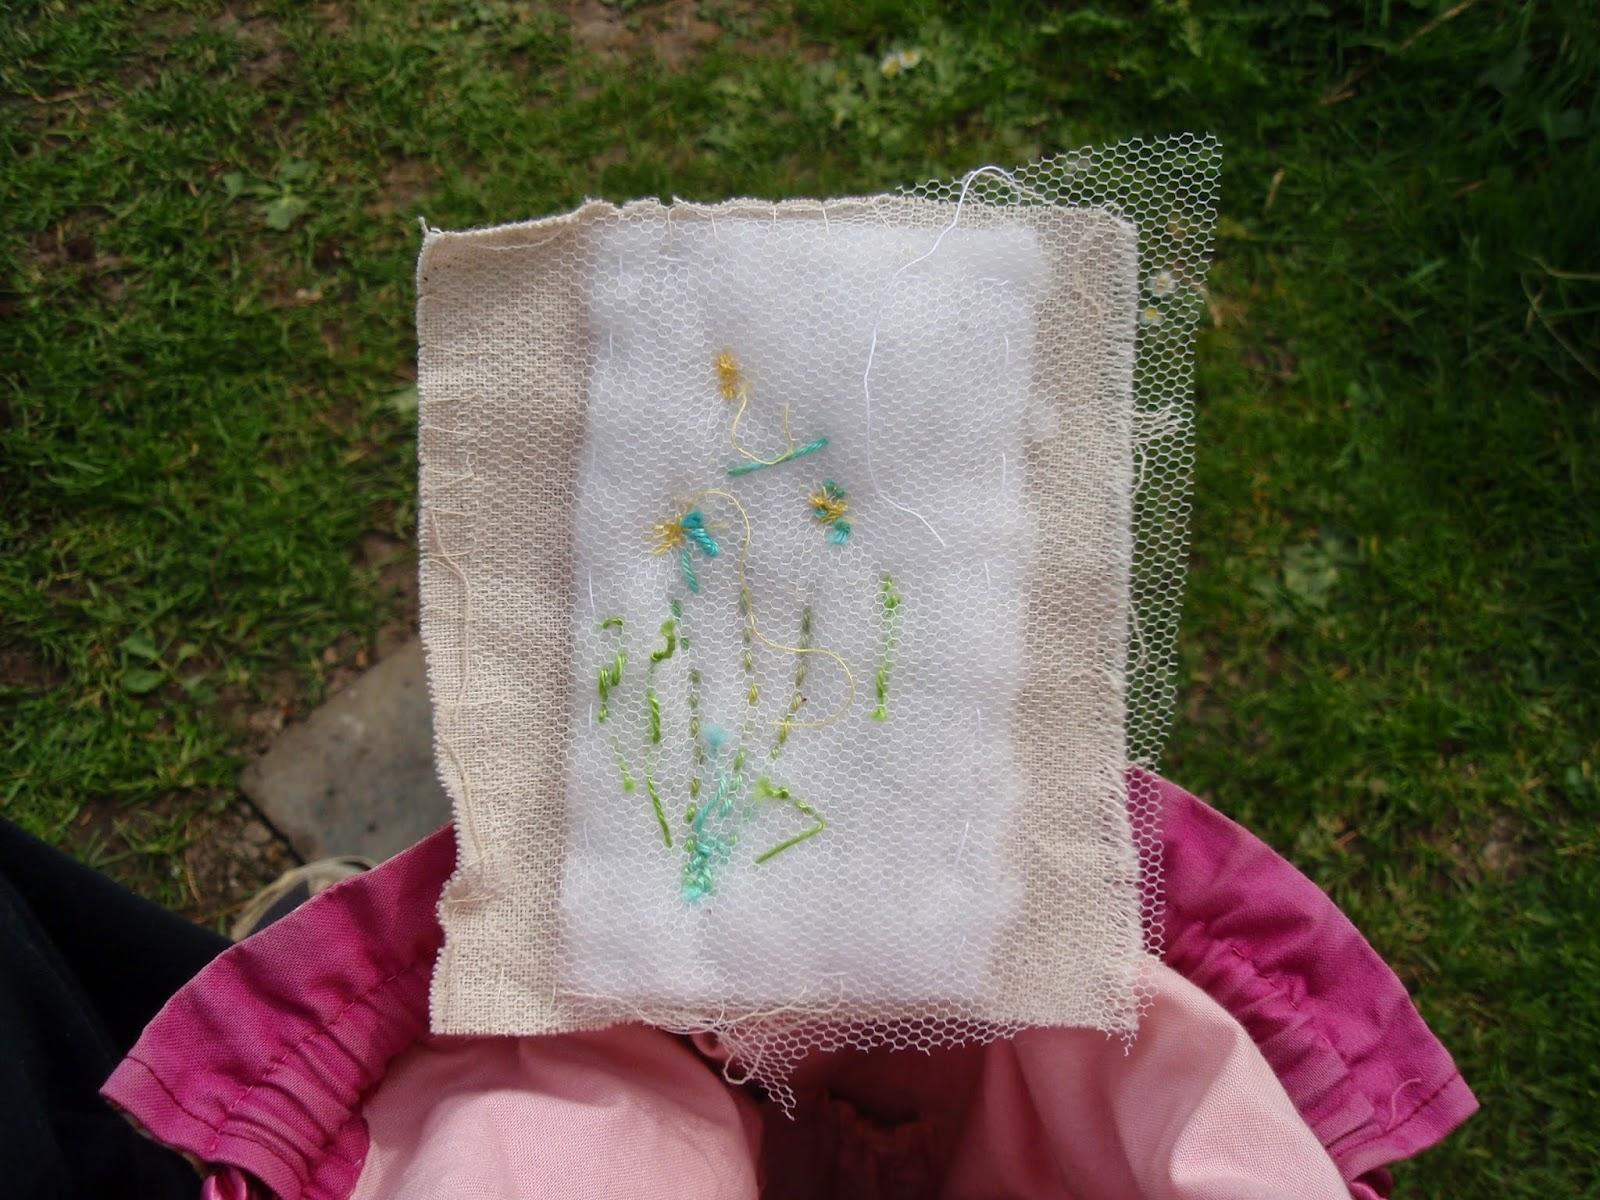 Layers of main fabric, wadding and backing fabric